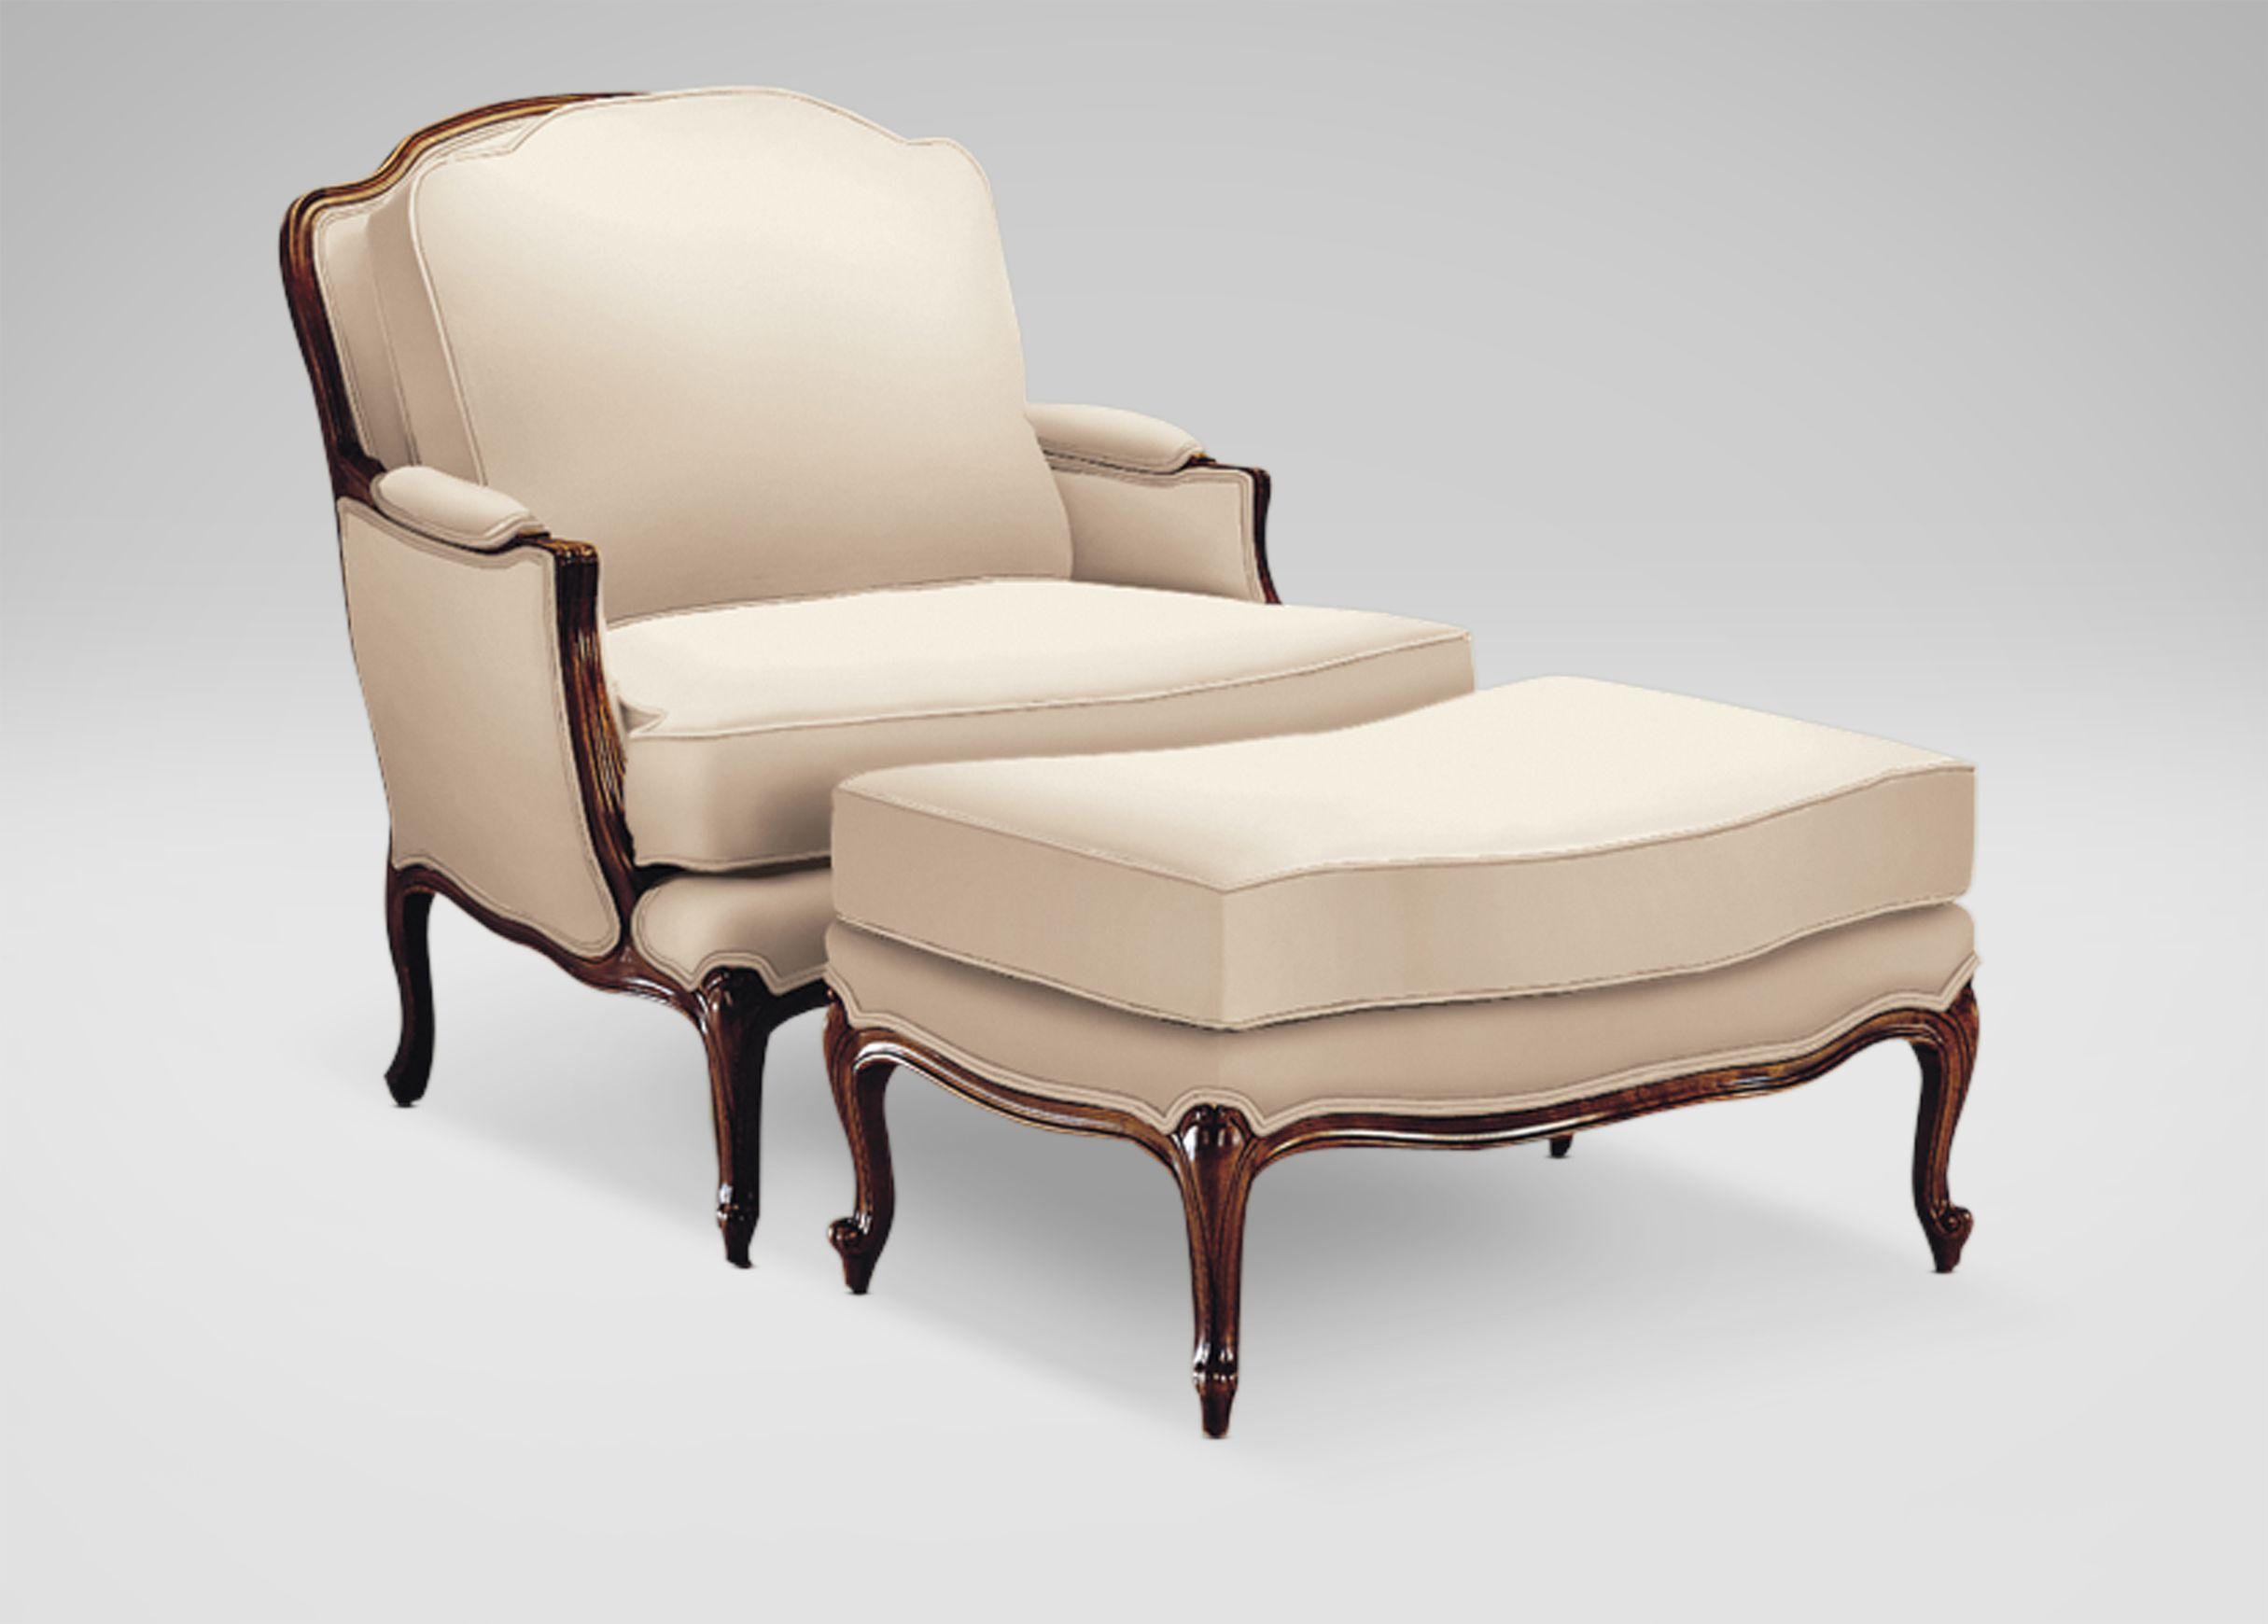 Versailles Chair blue ticking $1400